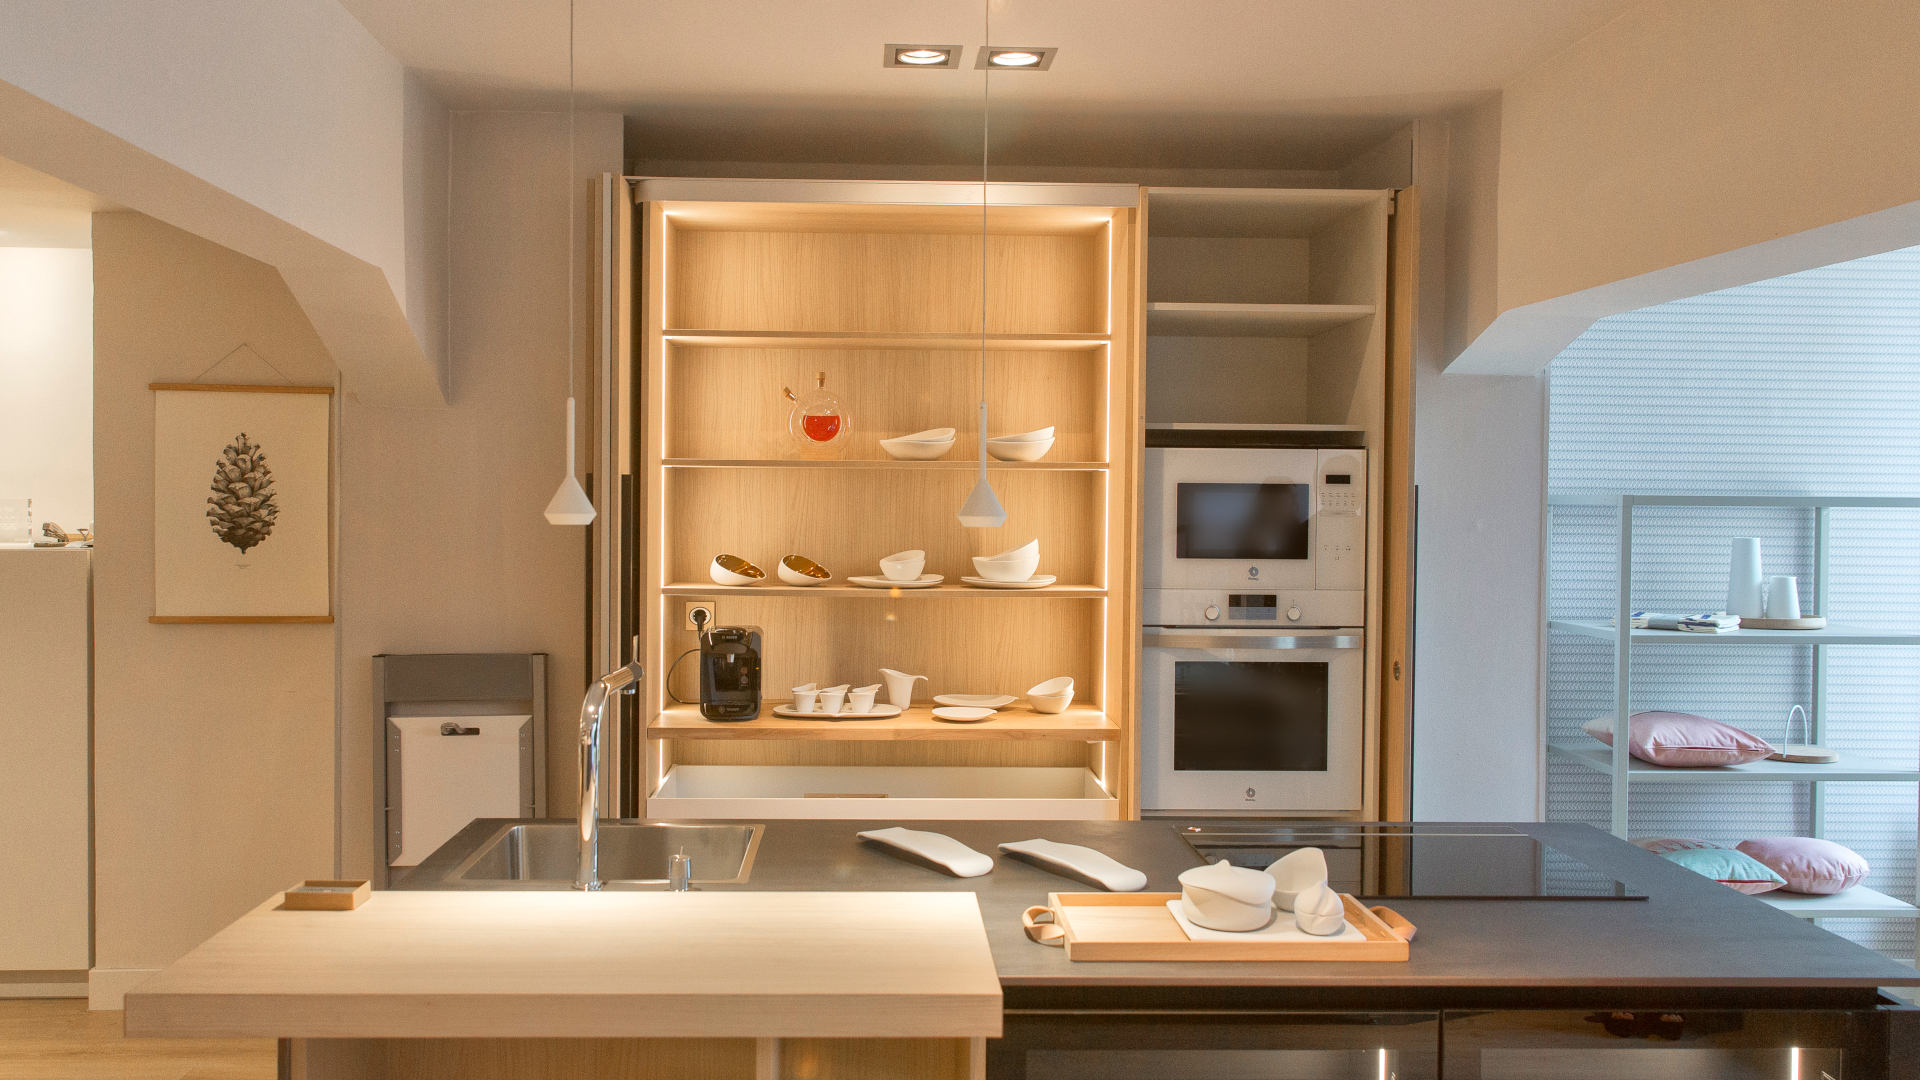 Cocina de diseño de Estudio Jauregi.